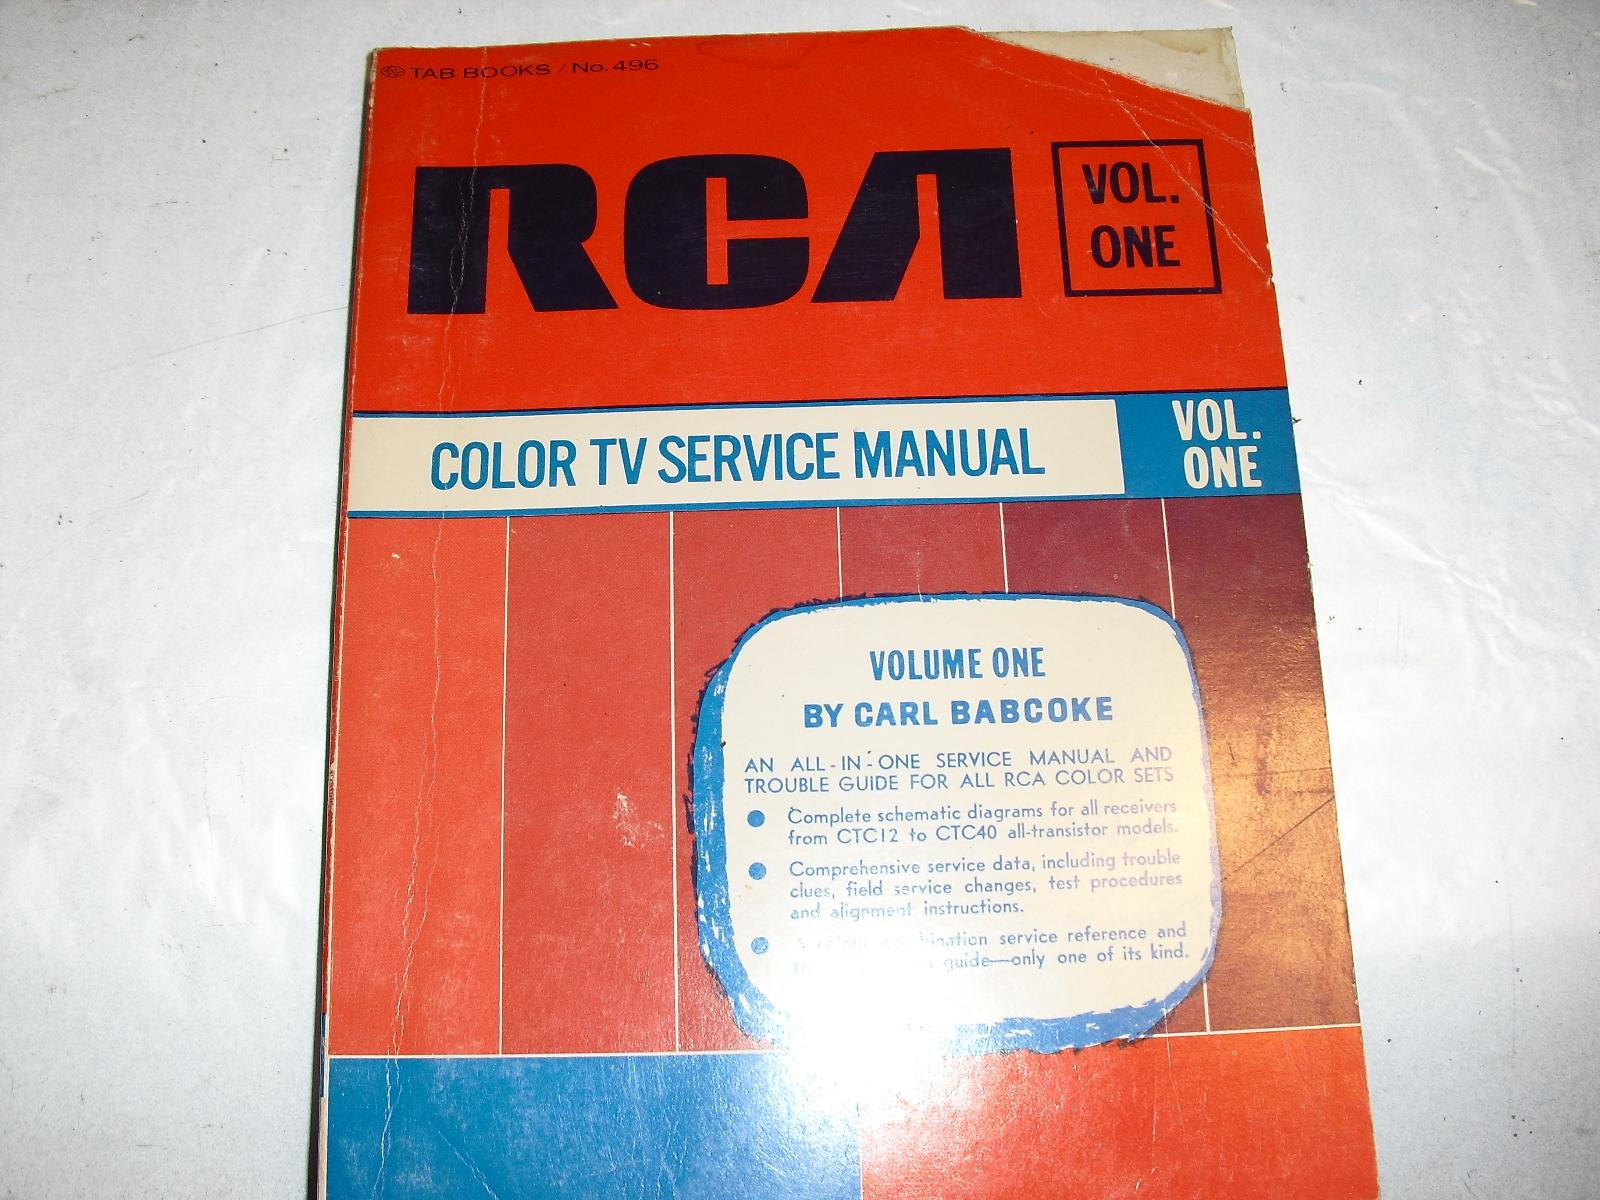 rca   vol  one  color  service  manual